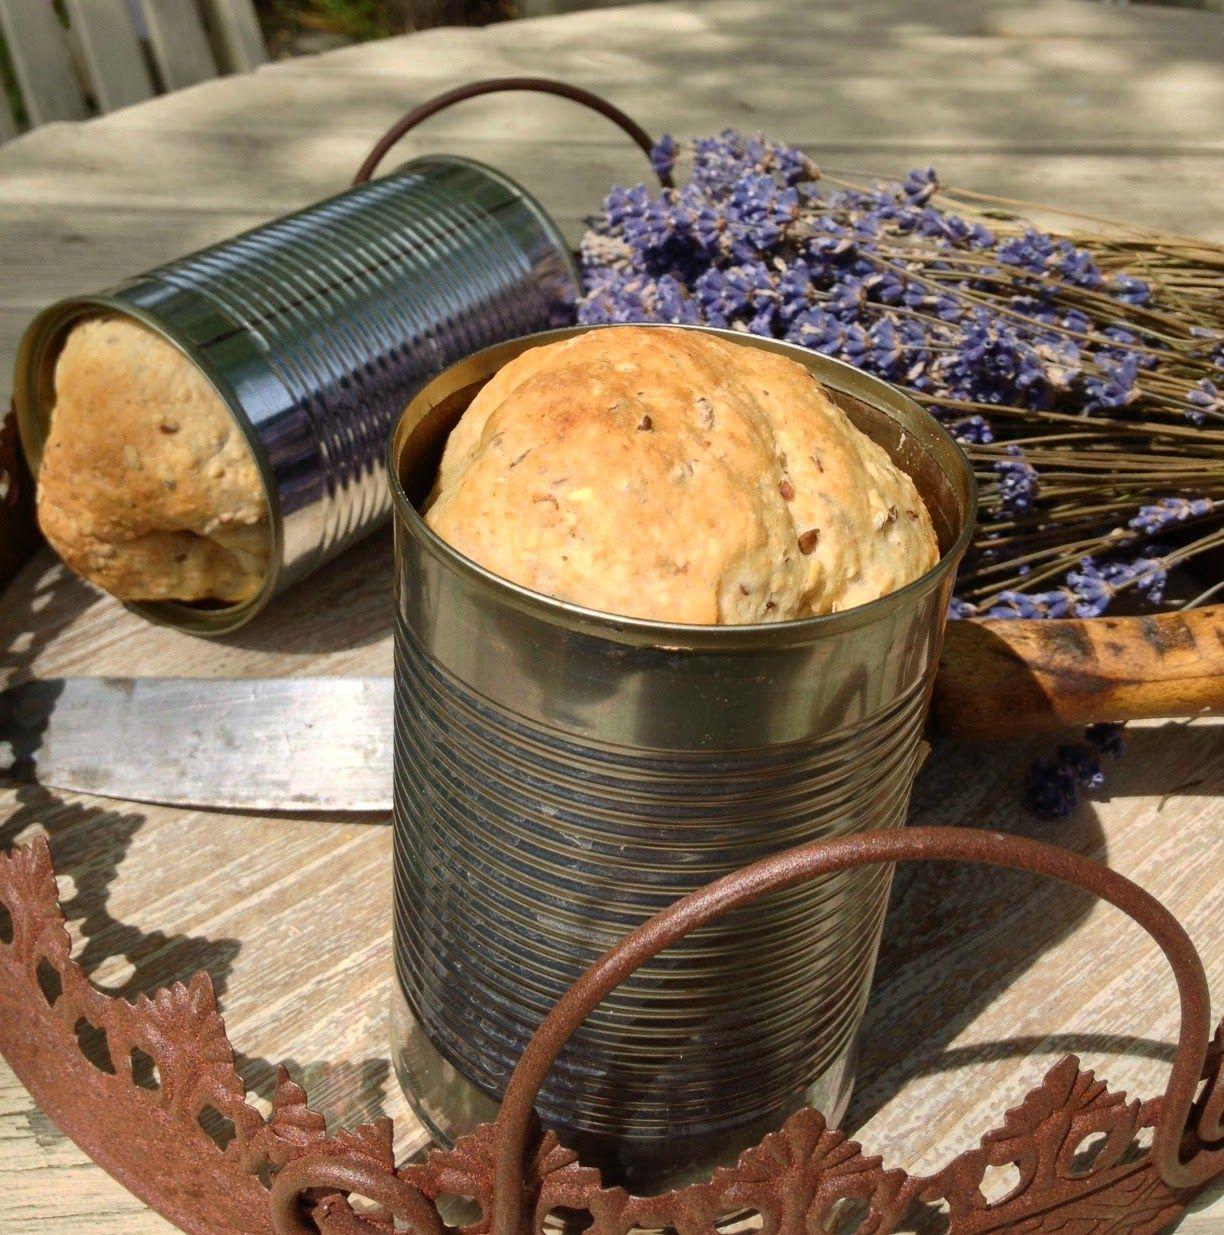 Campfire Tin Can Bread 4serv 1bread Dough Butter Margarine 1